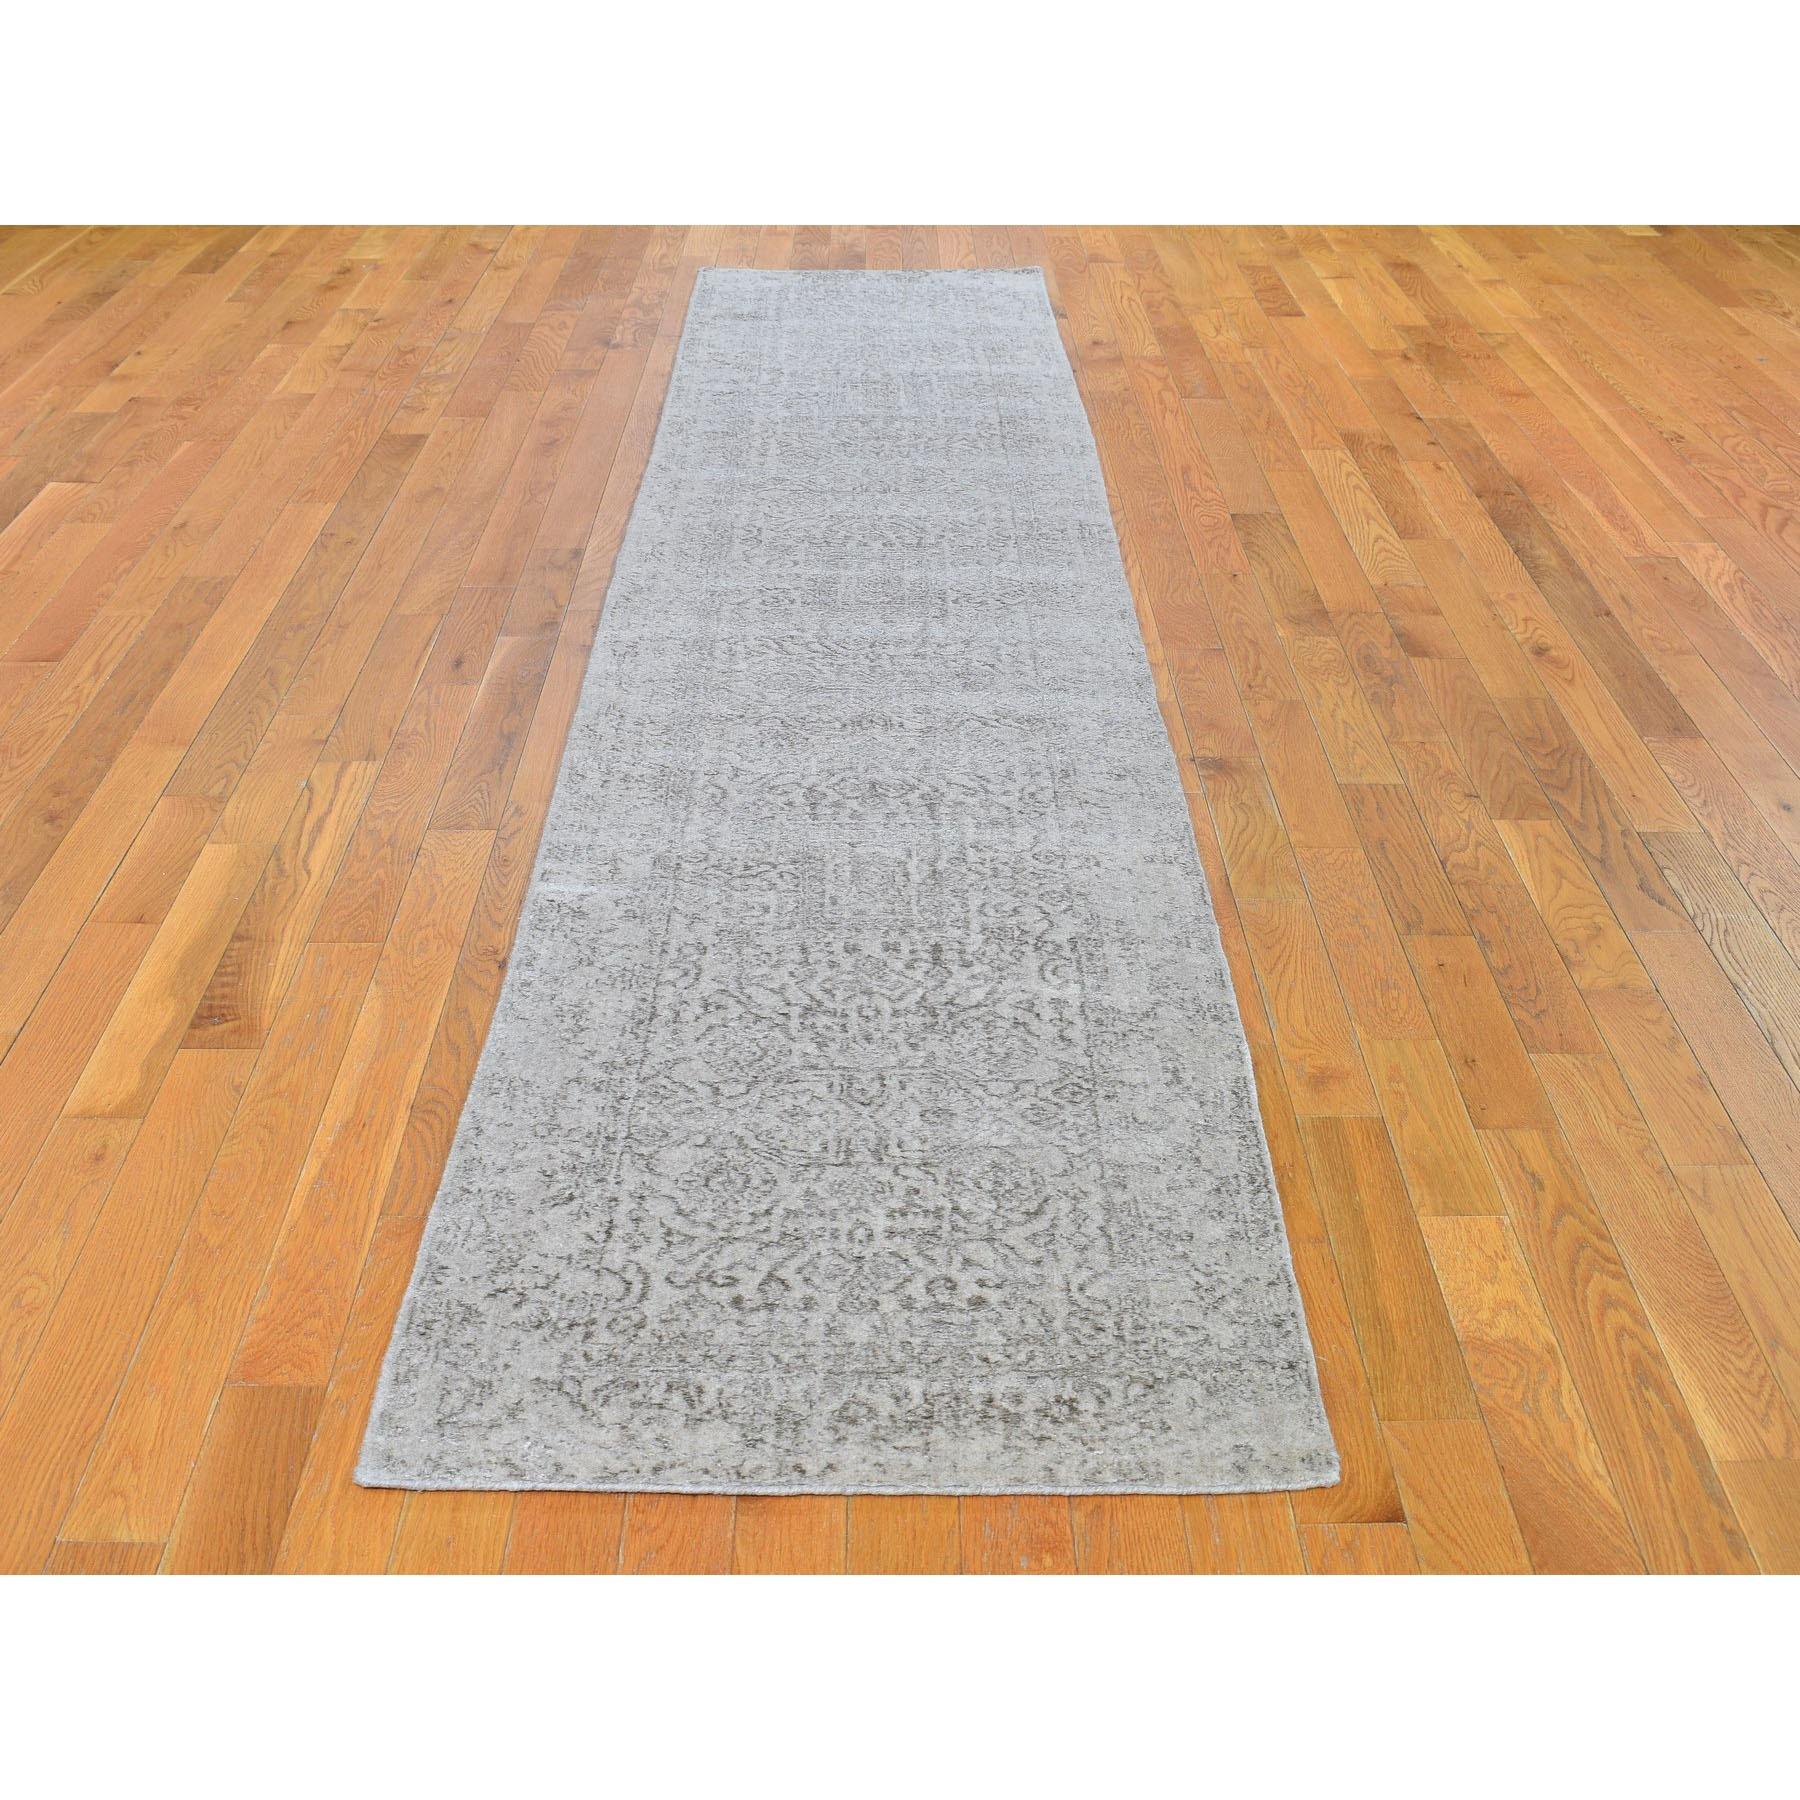 2-5 x12- Gray Fine jacquard Hand Loomed Modern Wool And Art Silk Runner Oriental Rug